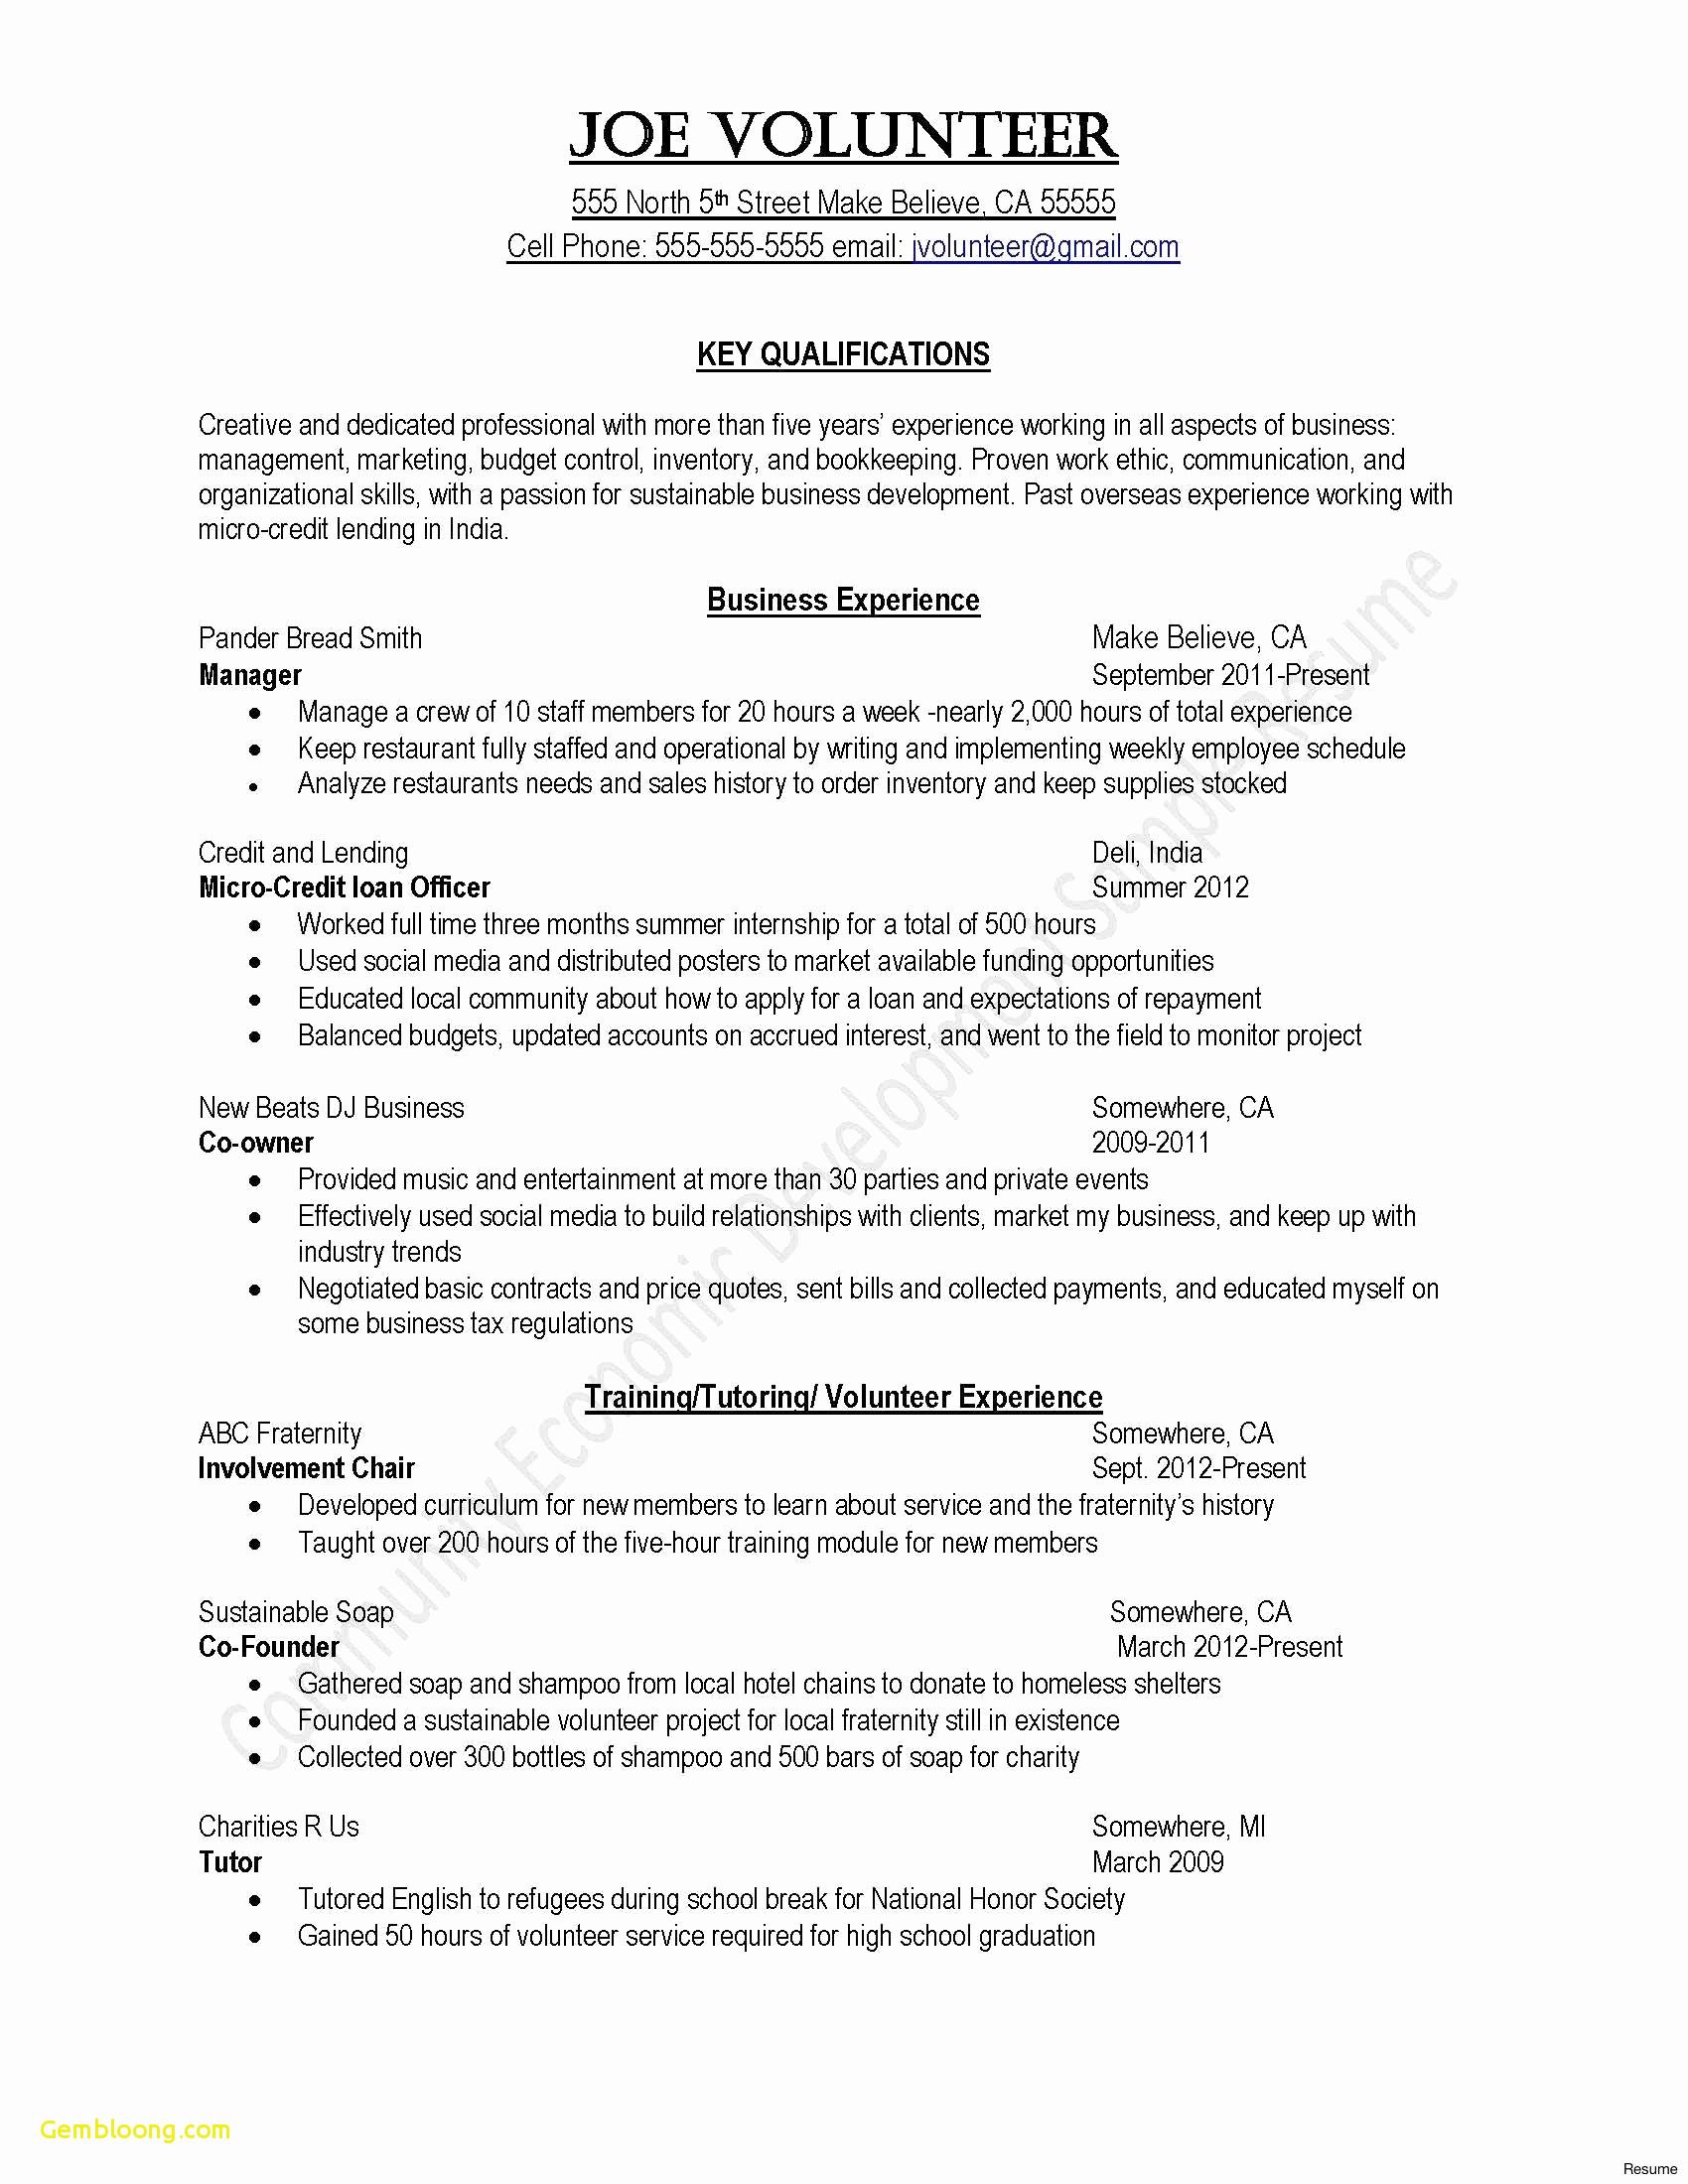 Maintenance Cover Letter Template - Best Business Resume Template New format Cover Letter for Resume